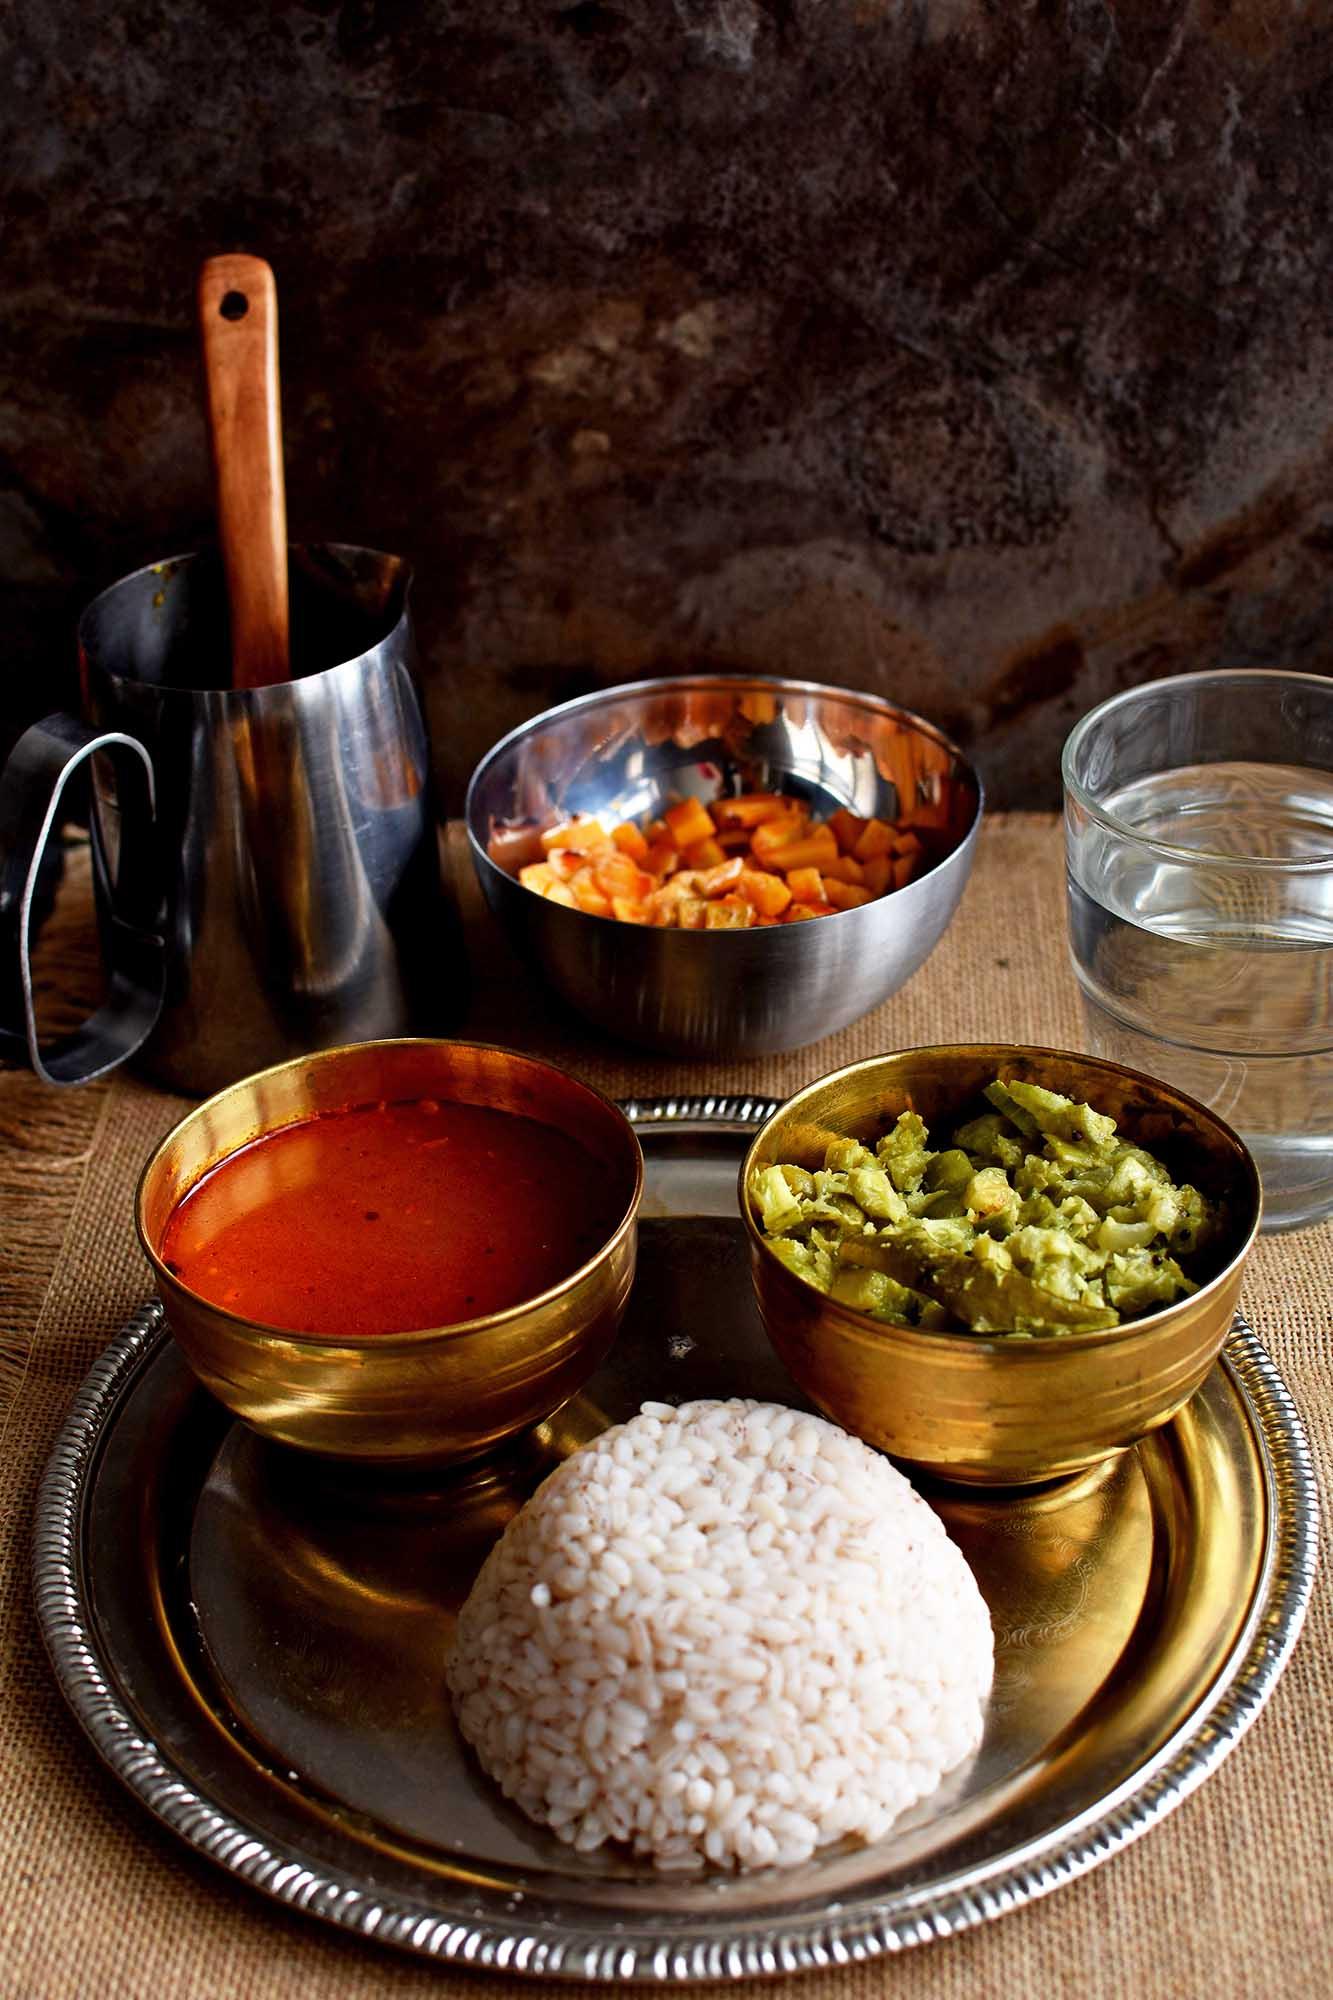 Kerala Style Tomato Rasam - Pepper Delight #pepperdelightblog #recipe #rasam #tomatorasam #keralarasam #kerala #onam #spicysoup #sadya #withoutrasampowder #soup #vegan #homemaderasam #festivals